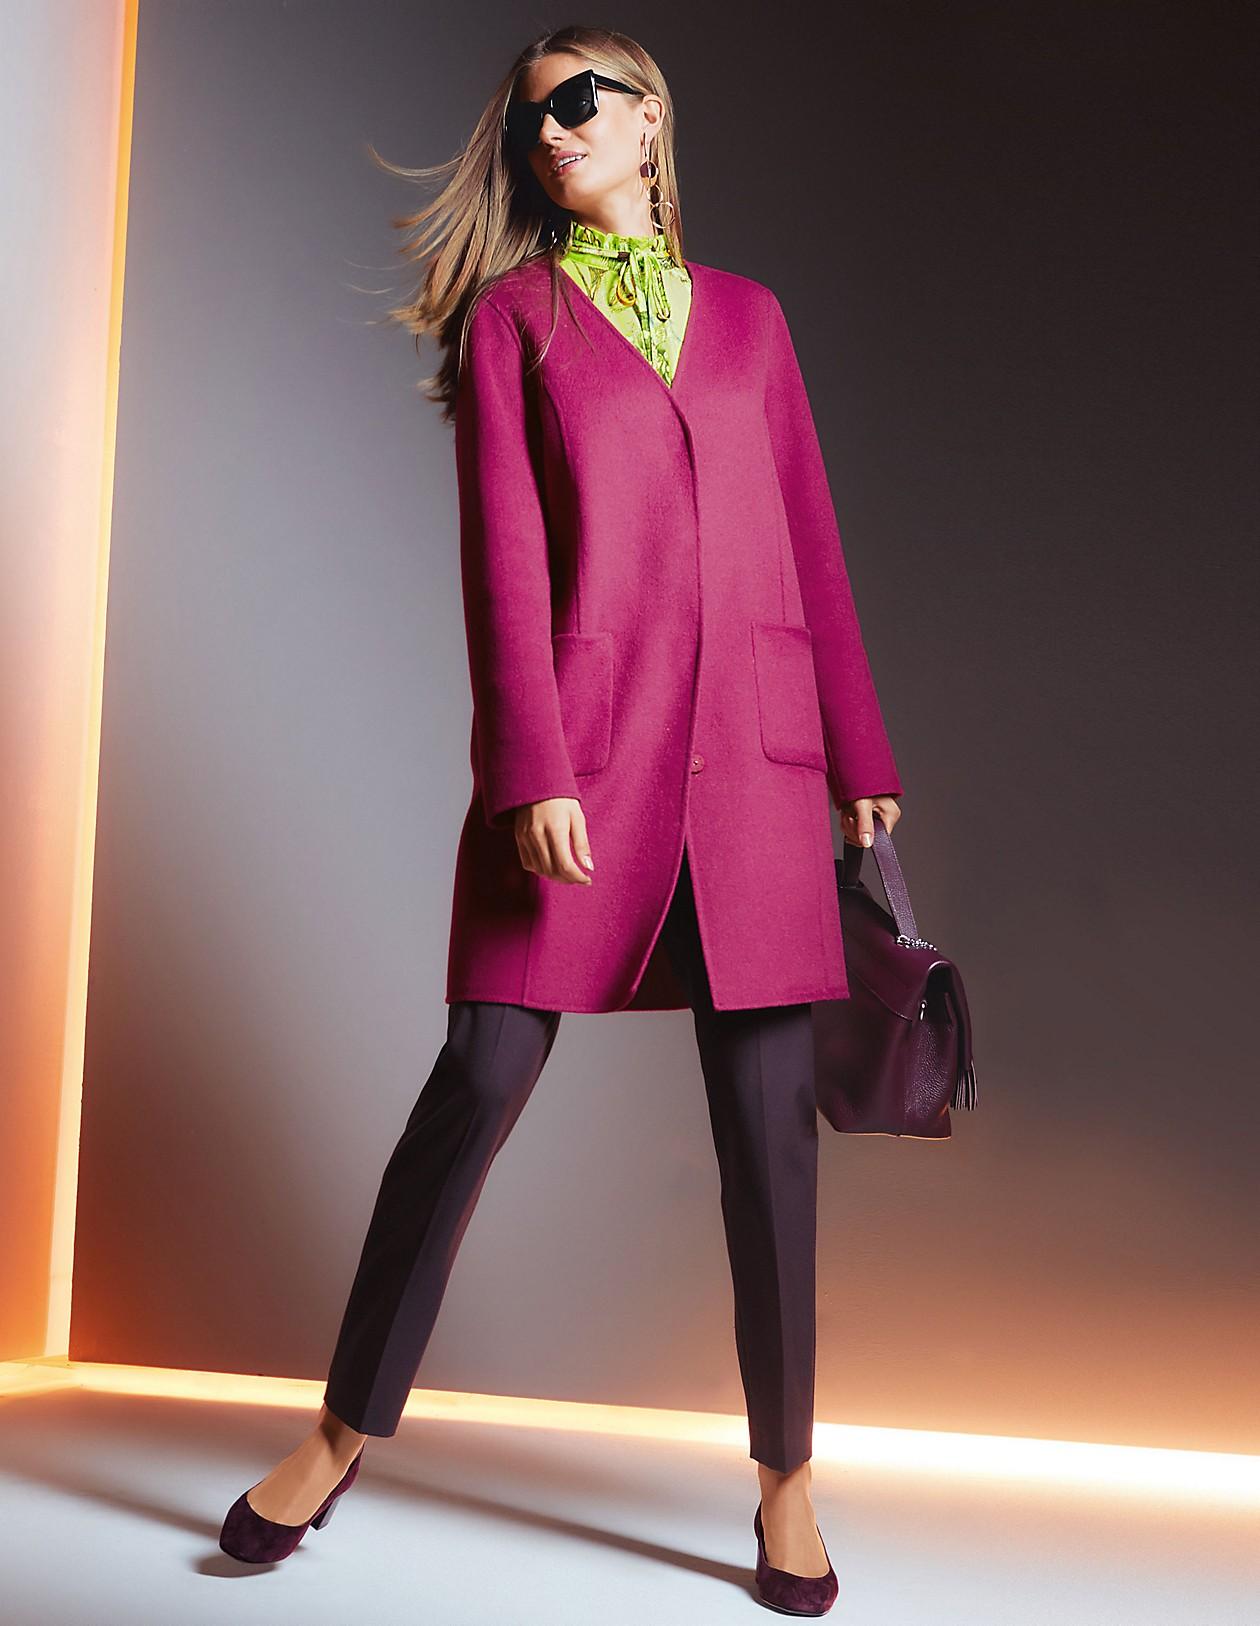 Doubleface Mantel, magenta, pink | MADELEINE Mode